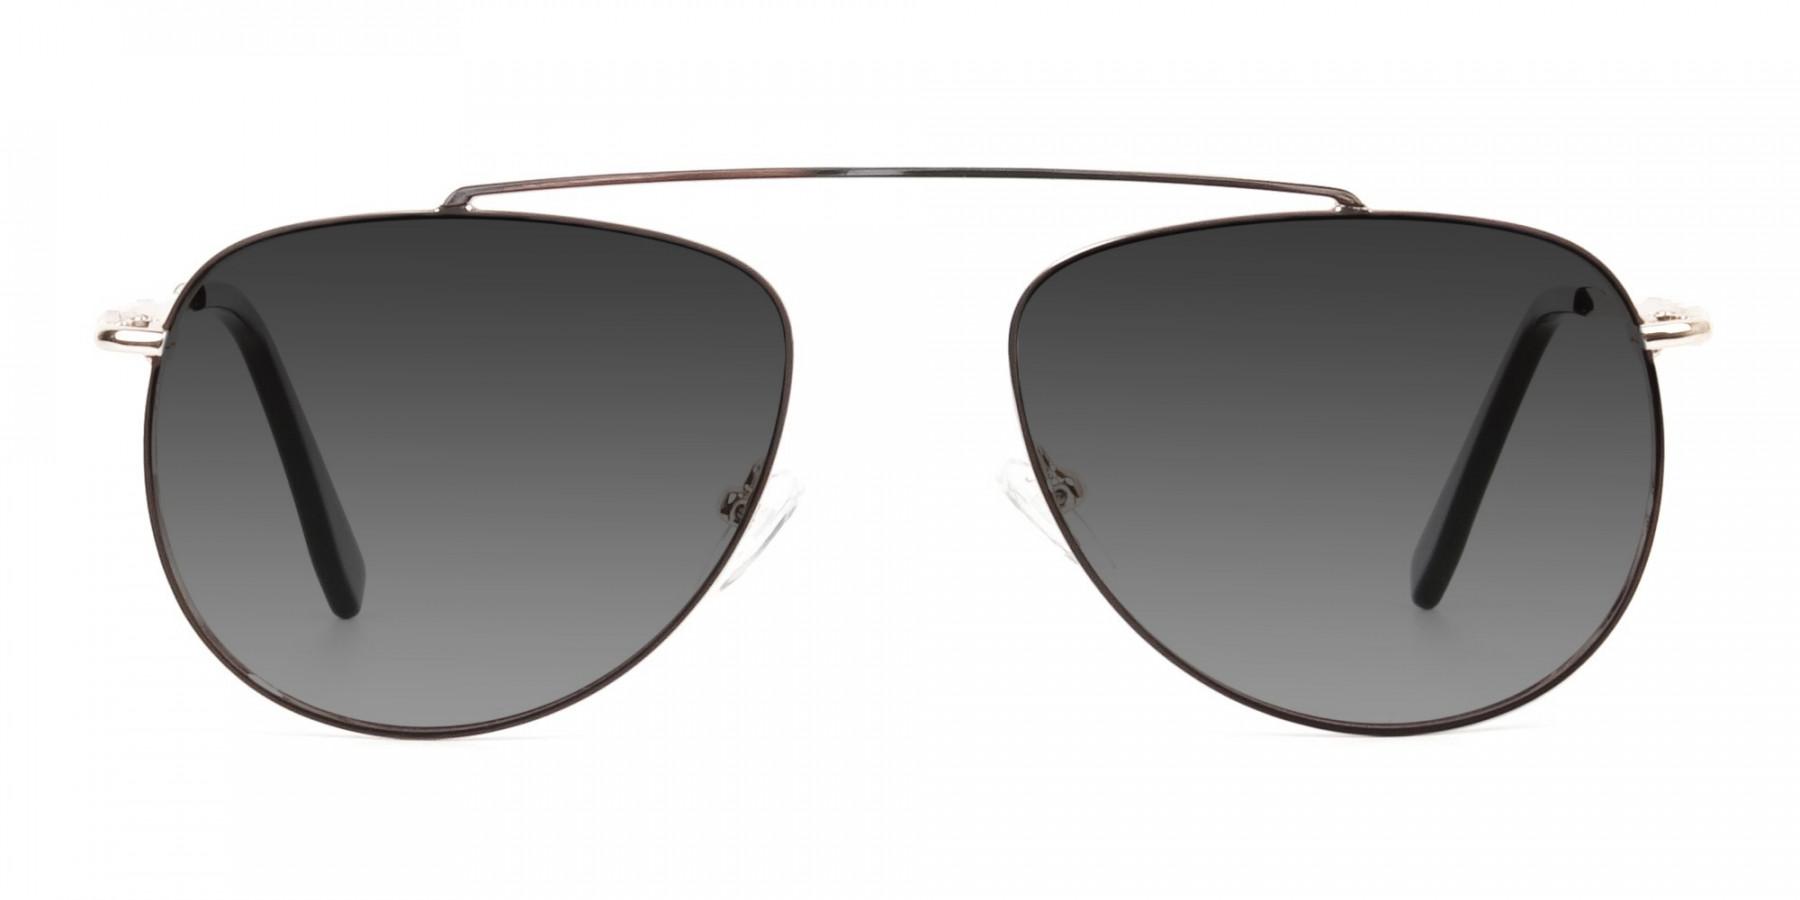 gold-brown-thin-metal-grey-tinted-aviator-sunglasses-3